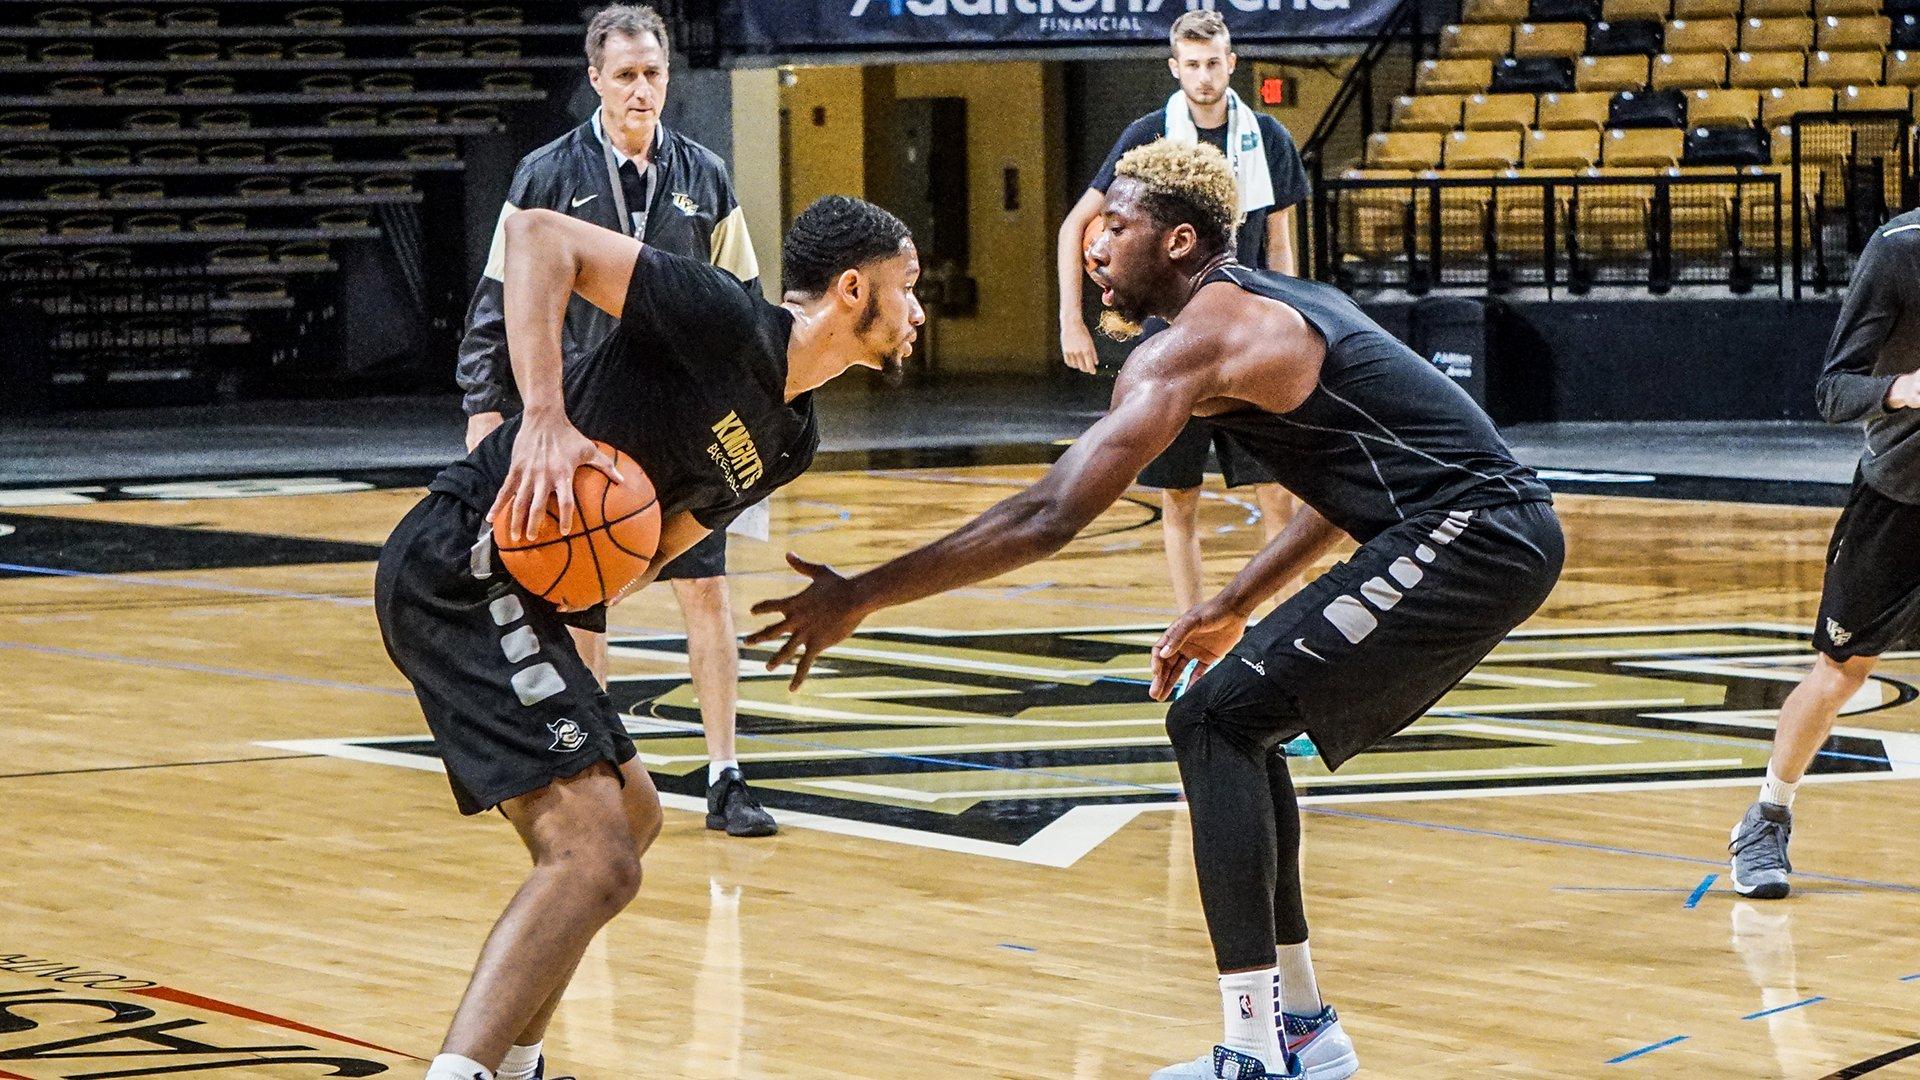 UCF Knights NCAA Basketball: grind szn ⚔️  @Sean_hollis32 ➡️ @loveyuat ⬇️ @Frank_Bertz 🆚 @Ibrahimfamo...